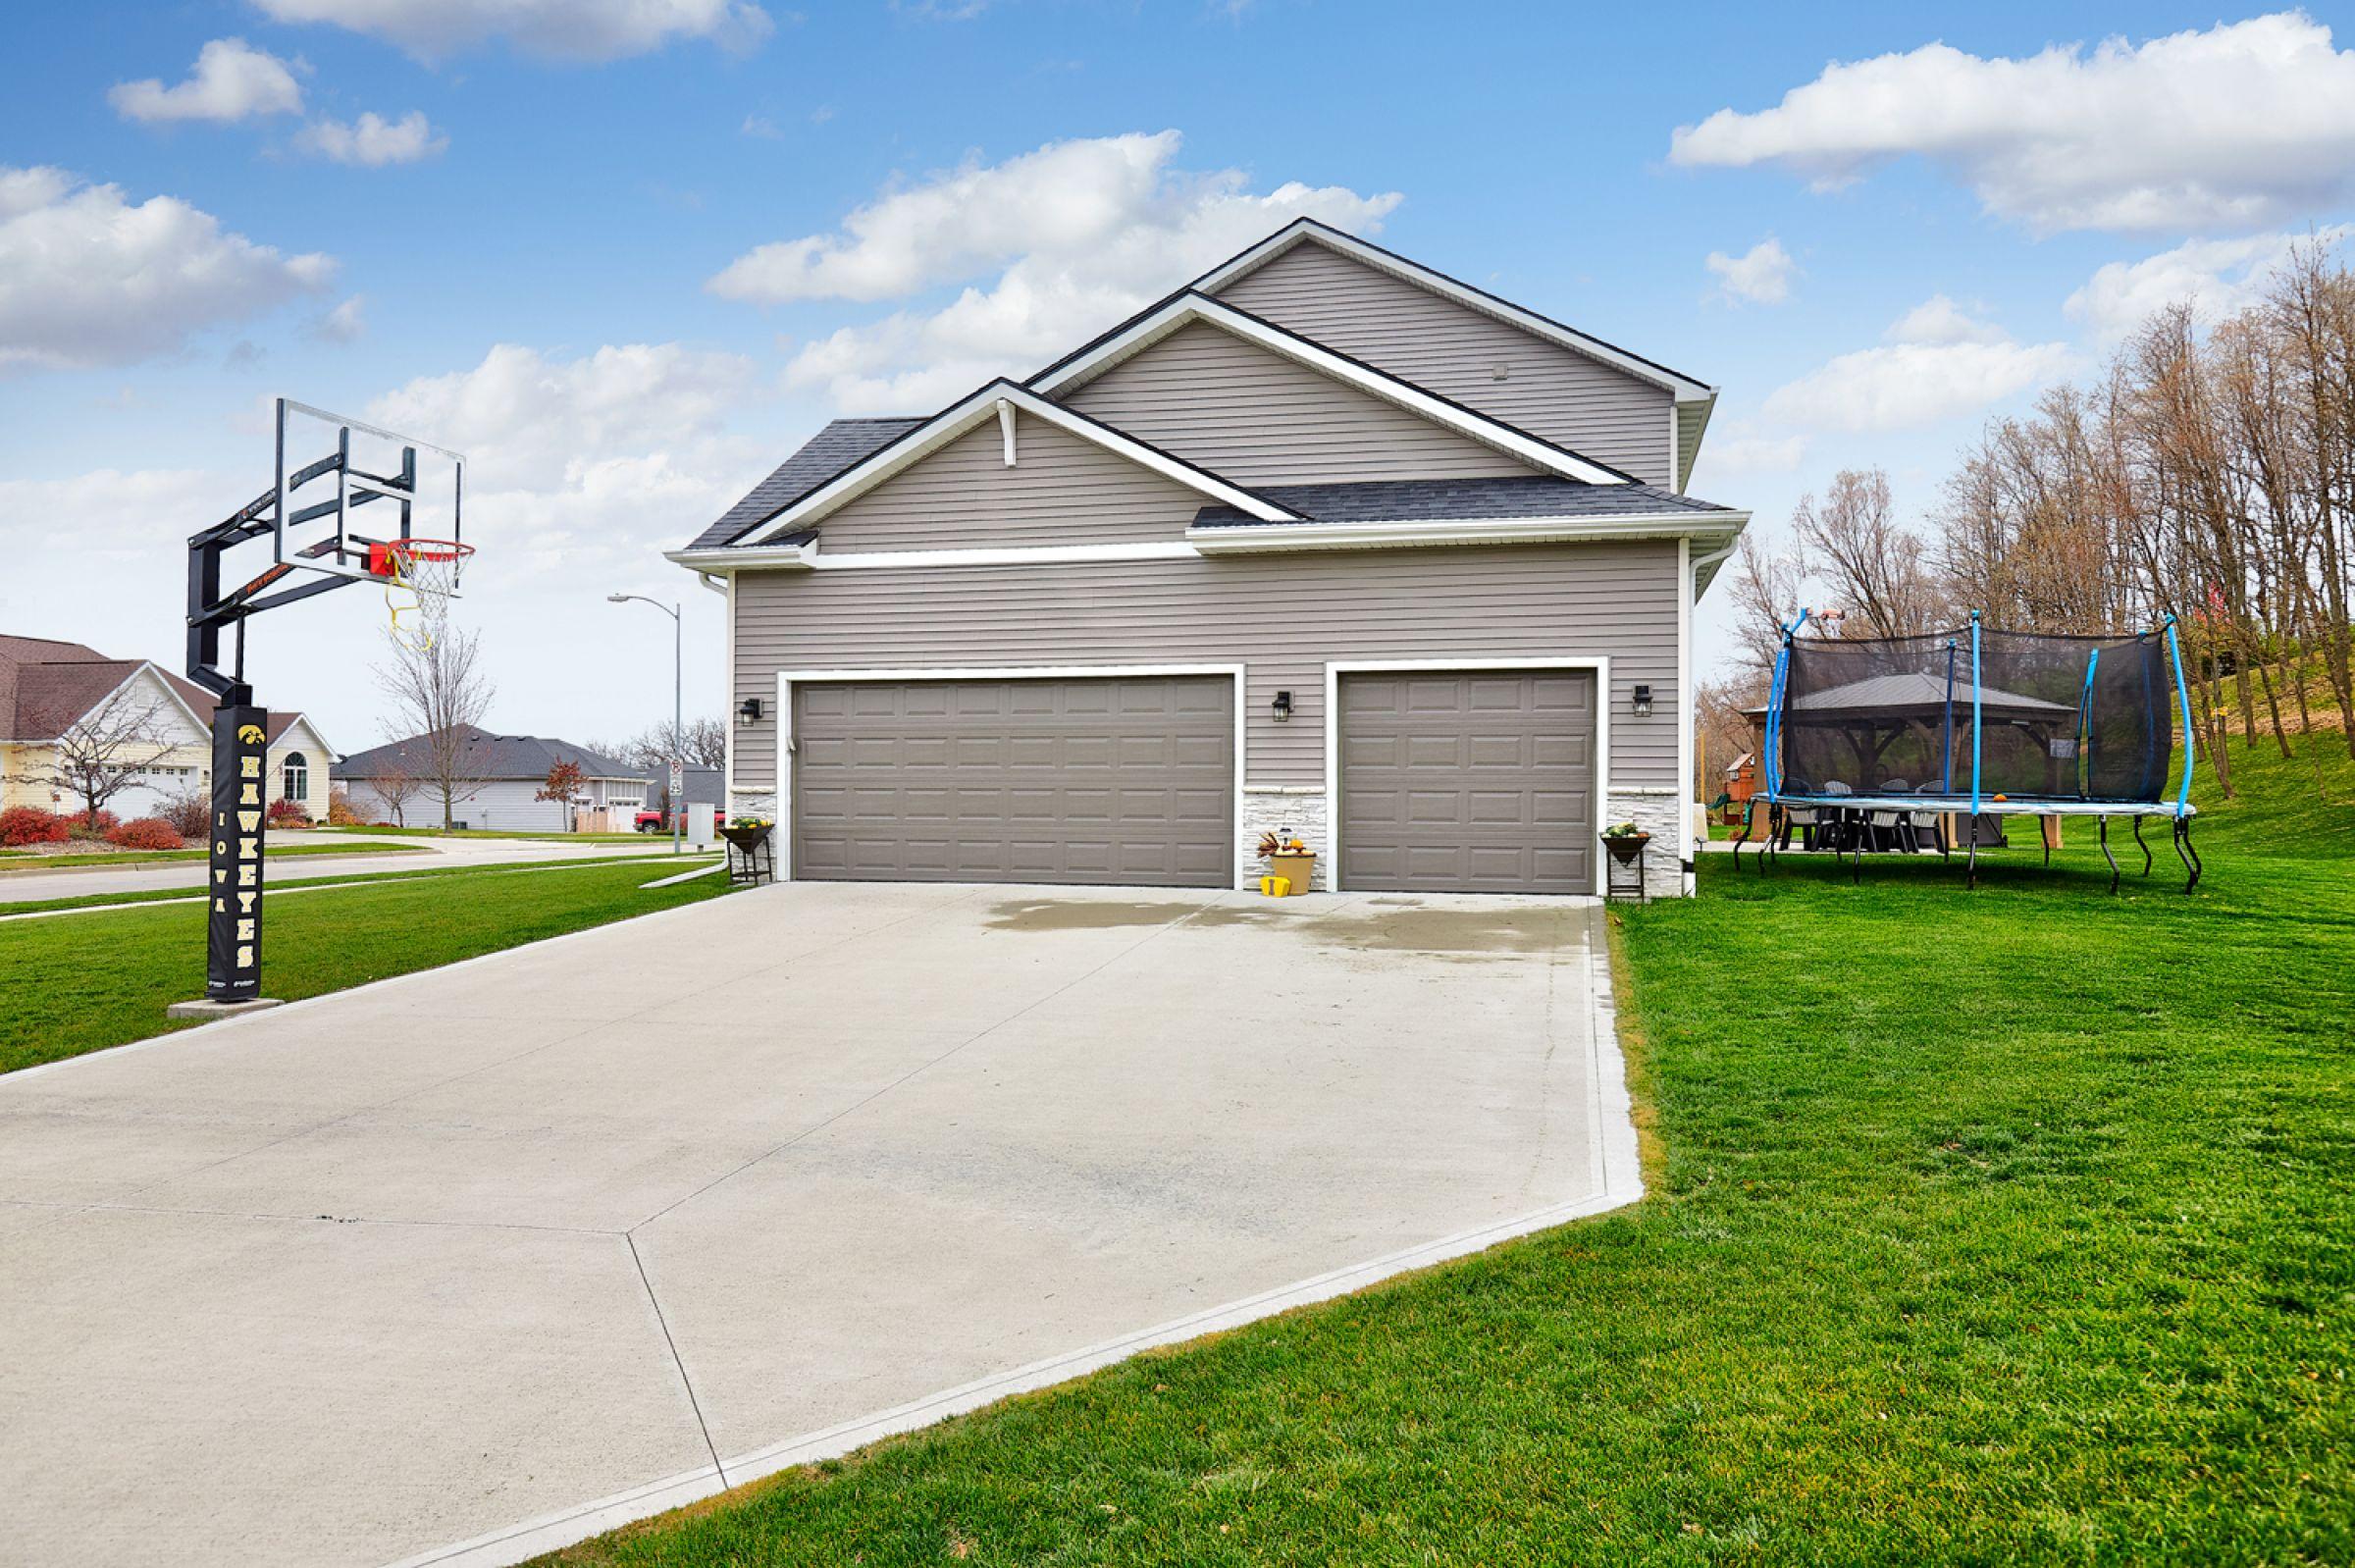 residential-warren-county-iowa-1-acres-listing-number-15254-2-2020-11-11-165801.jpg